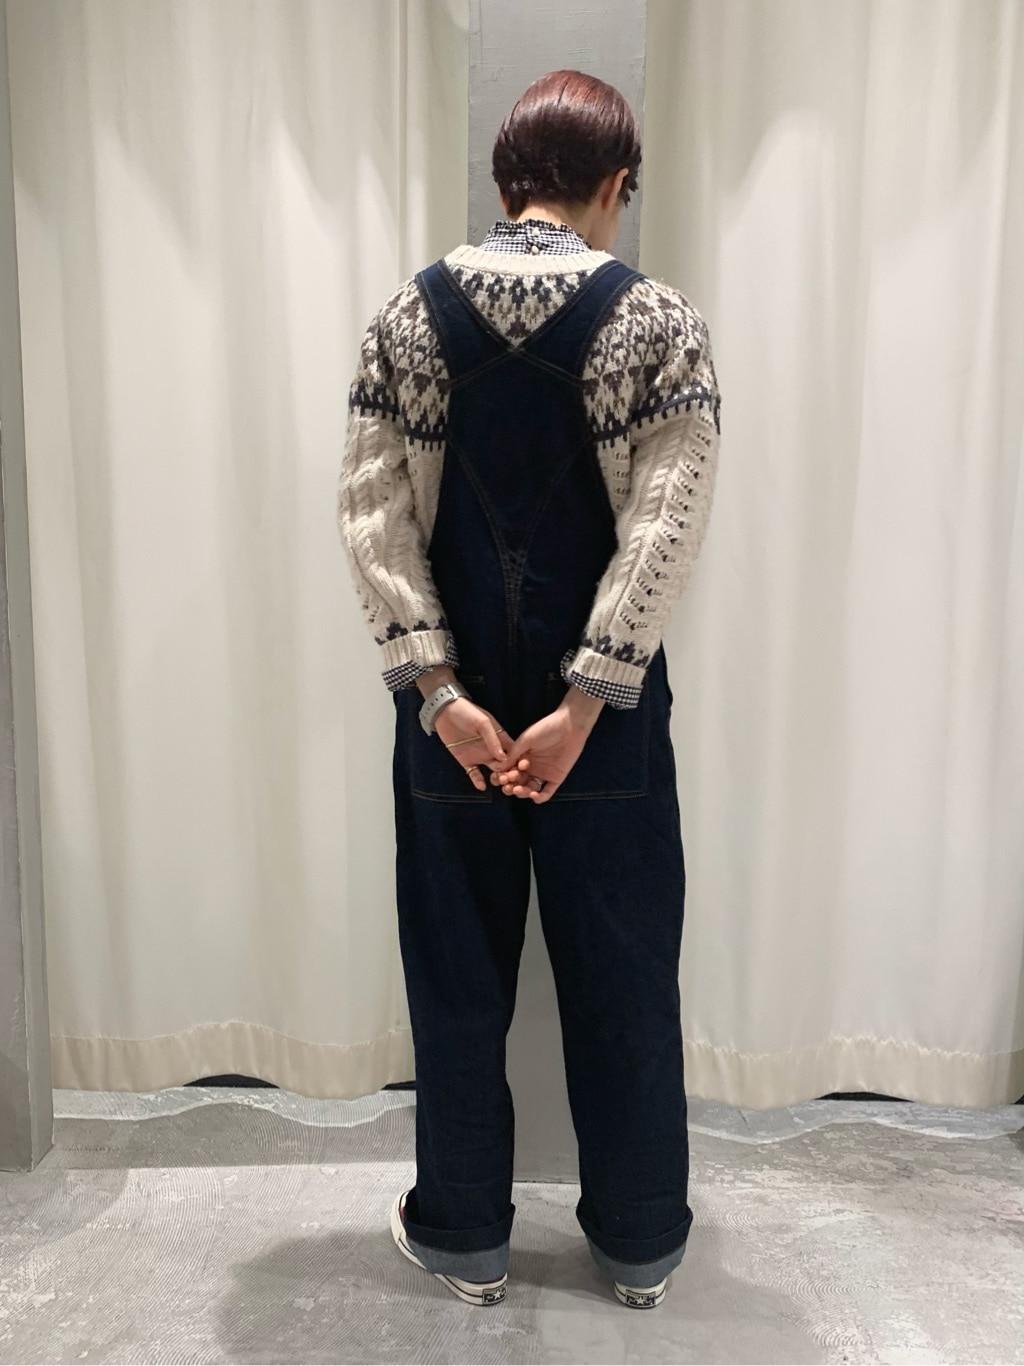 - CHILD WOMAN CHILD WOMAN , PAR ICI ルミネ横浜 身長:158cm 2020.11.17